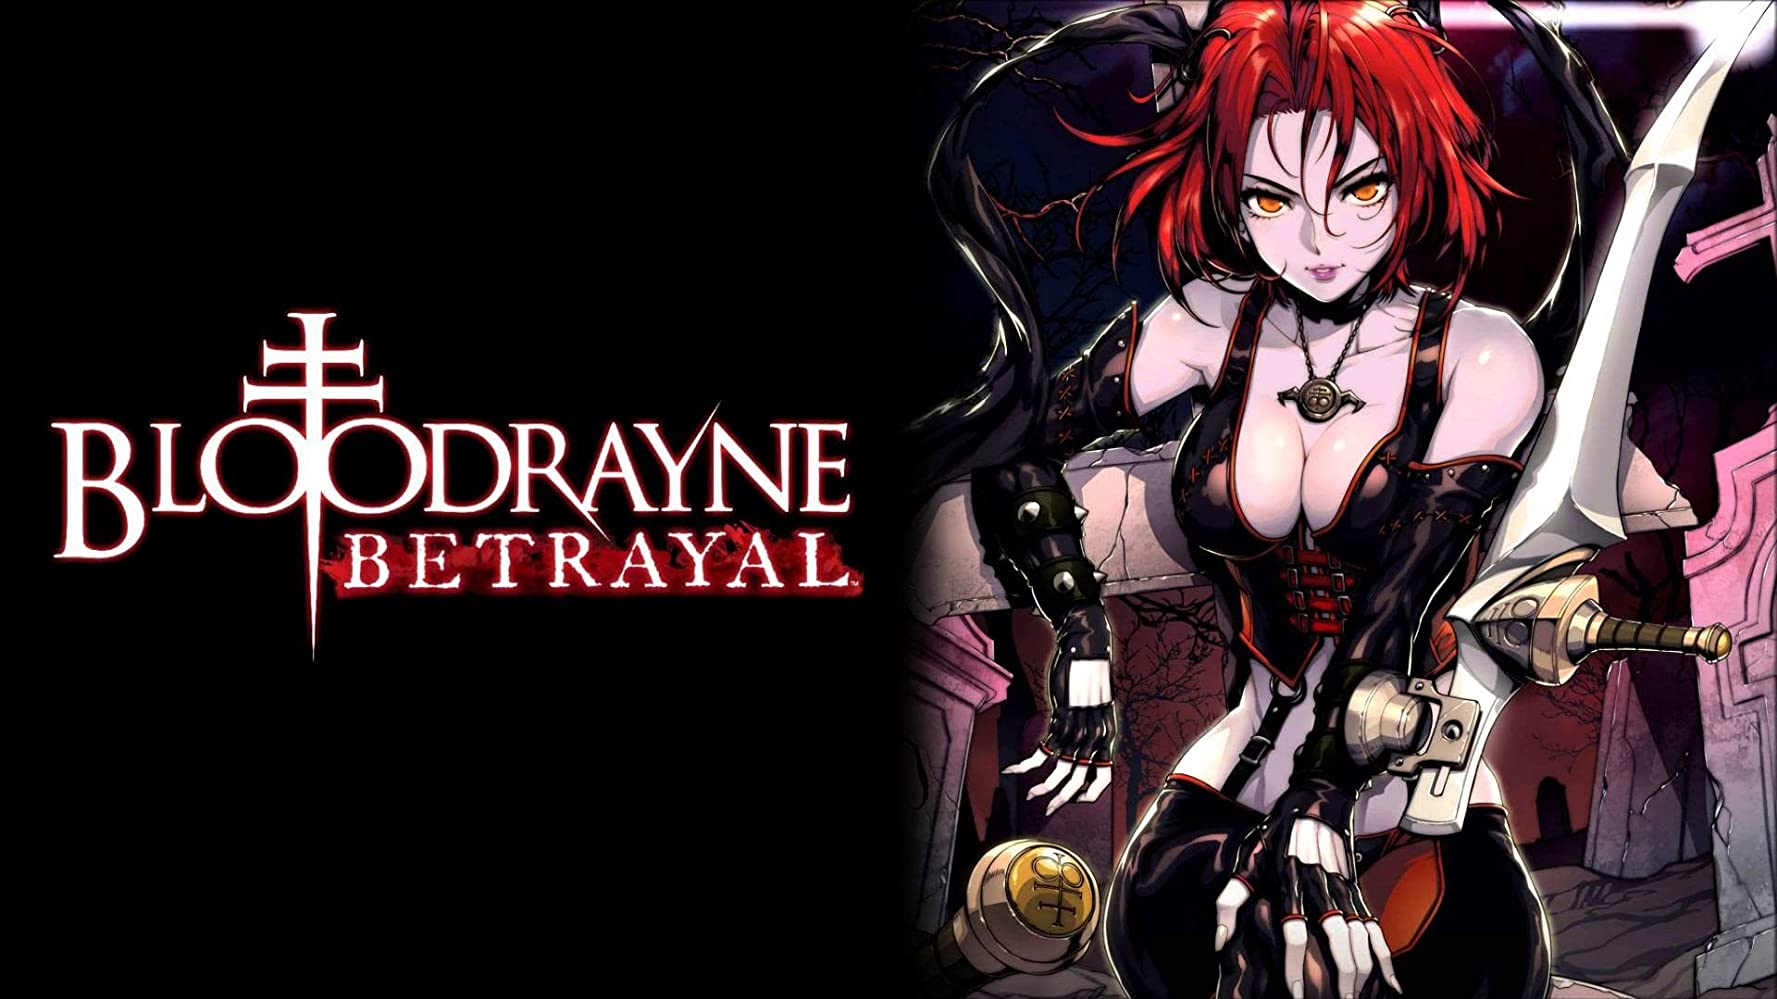 Bloodrayne Betrayal 2011